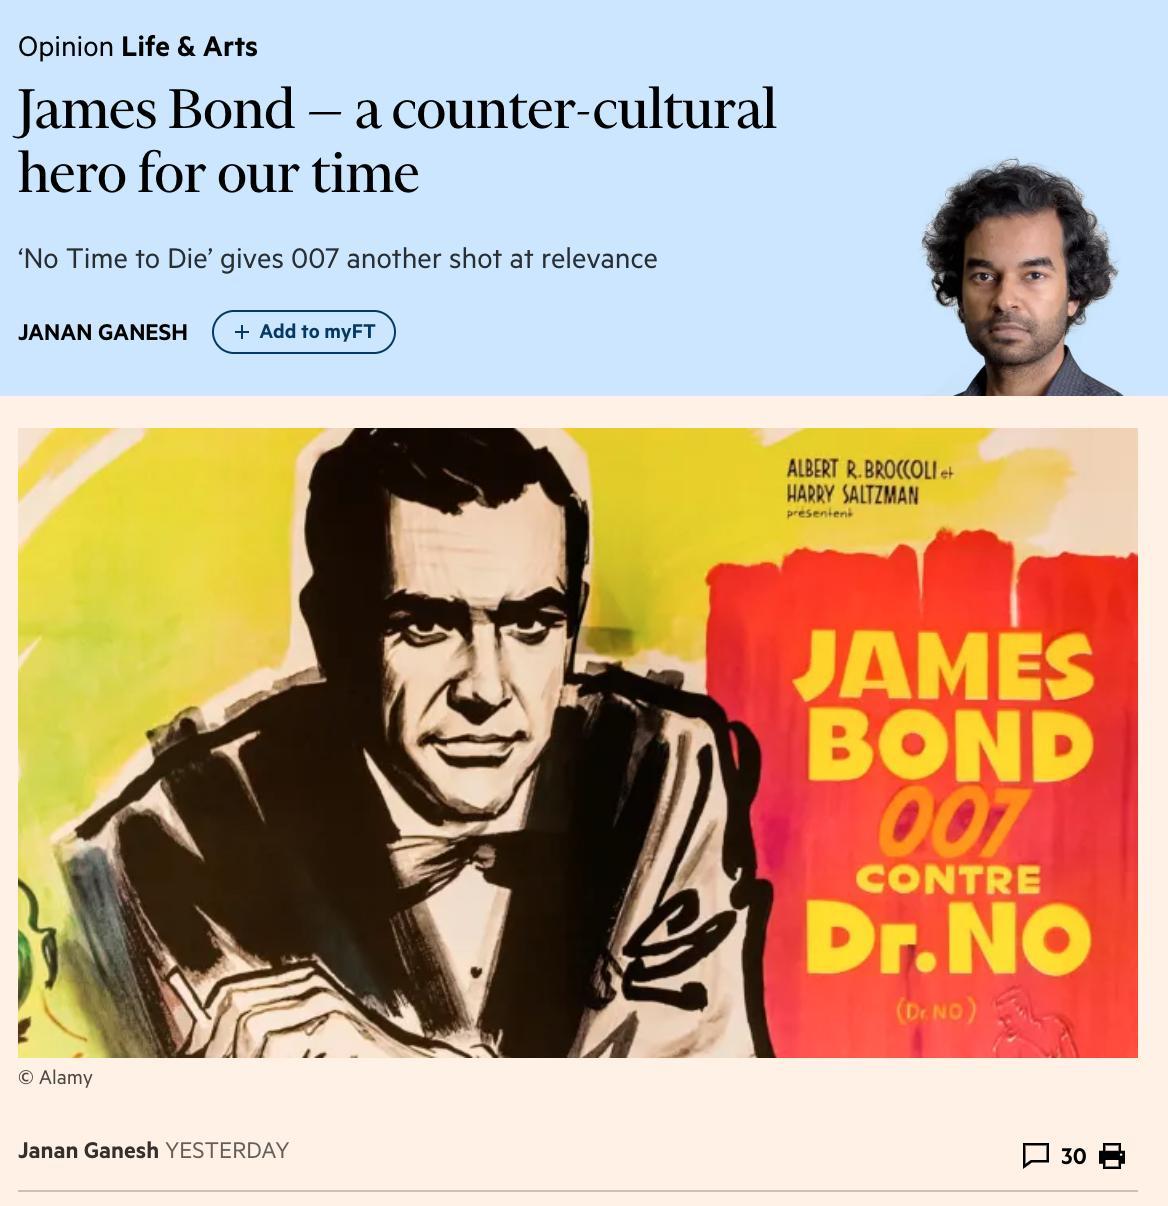 Excellent on Bond as countercultural…